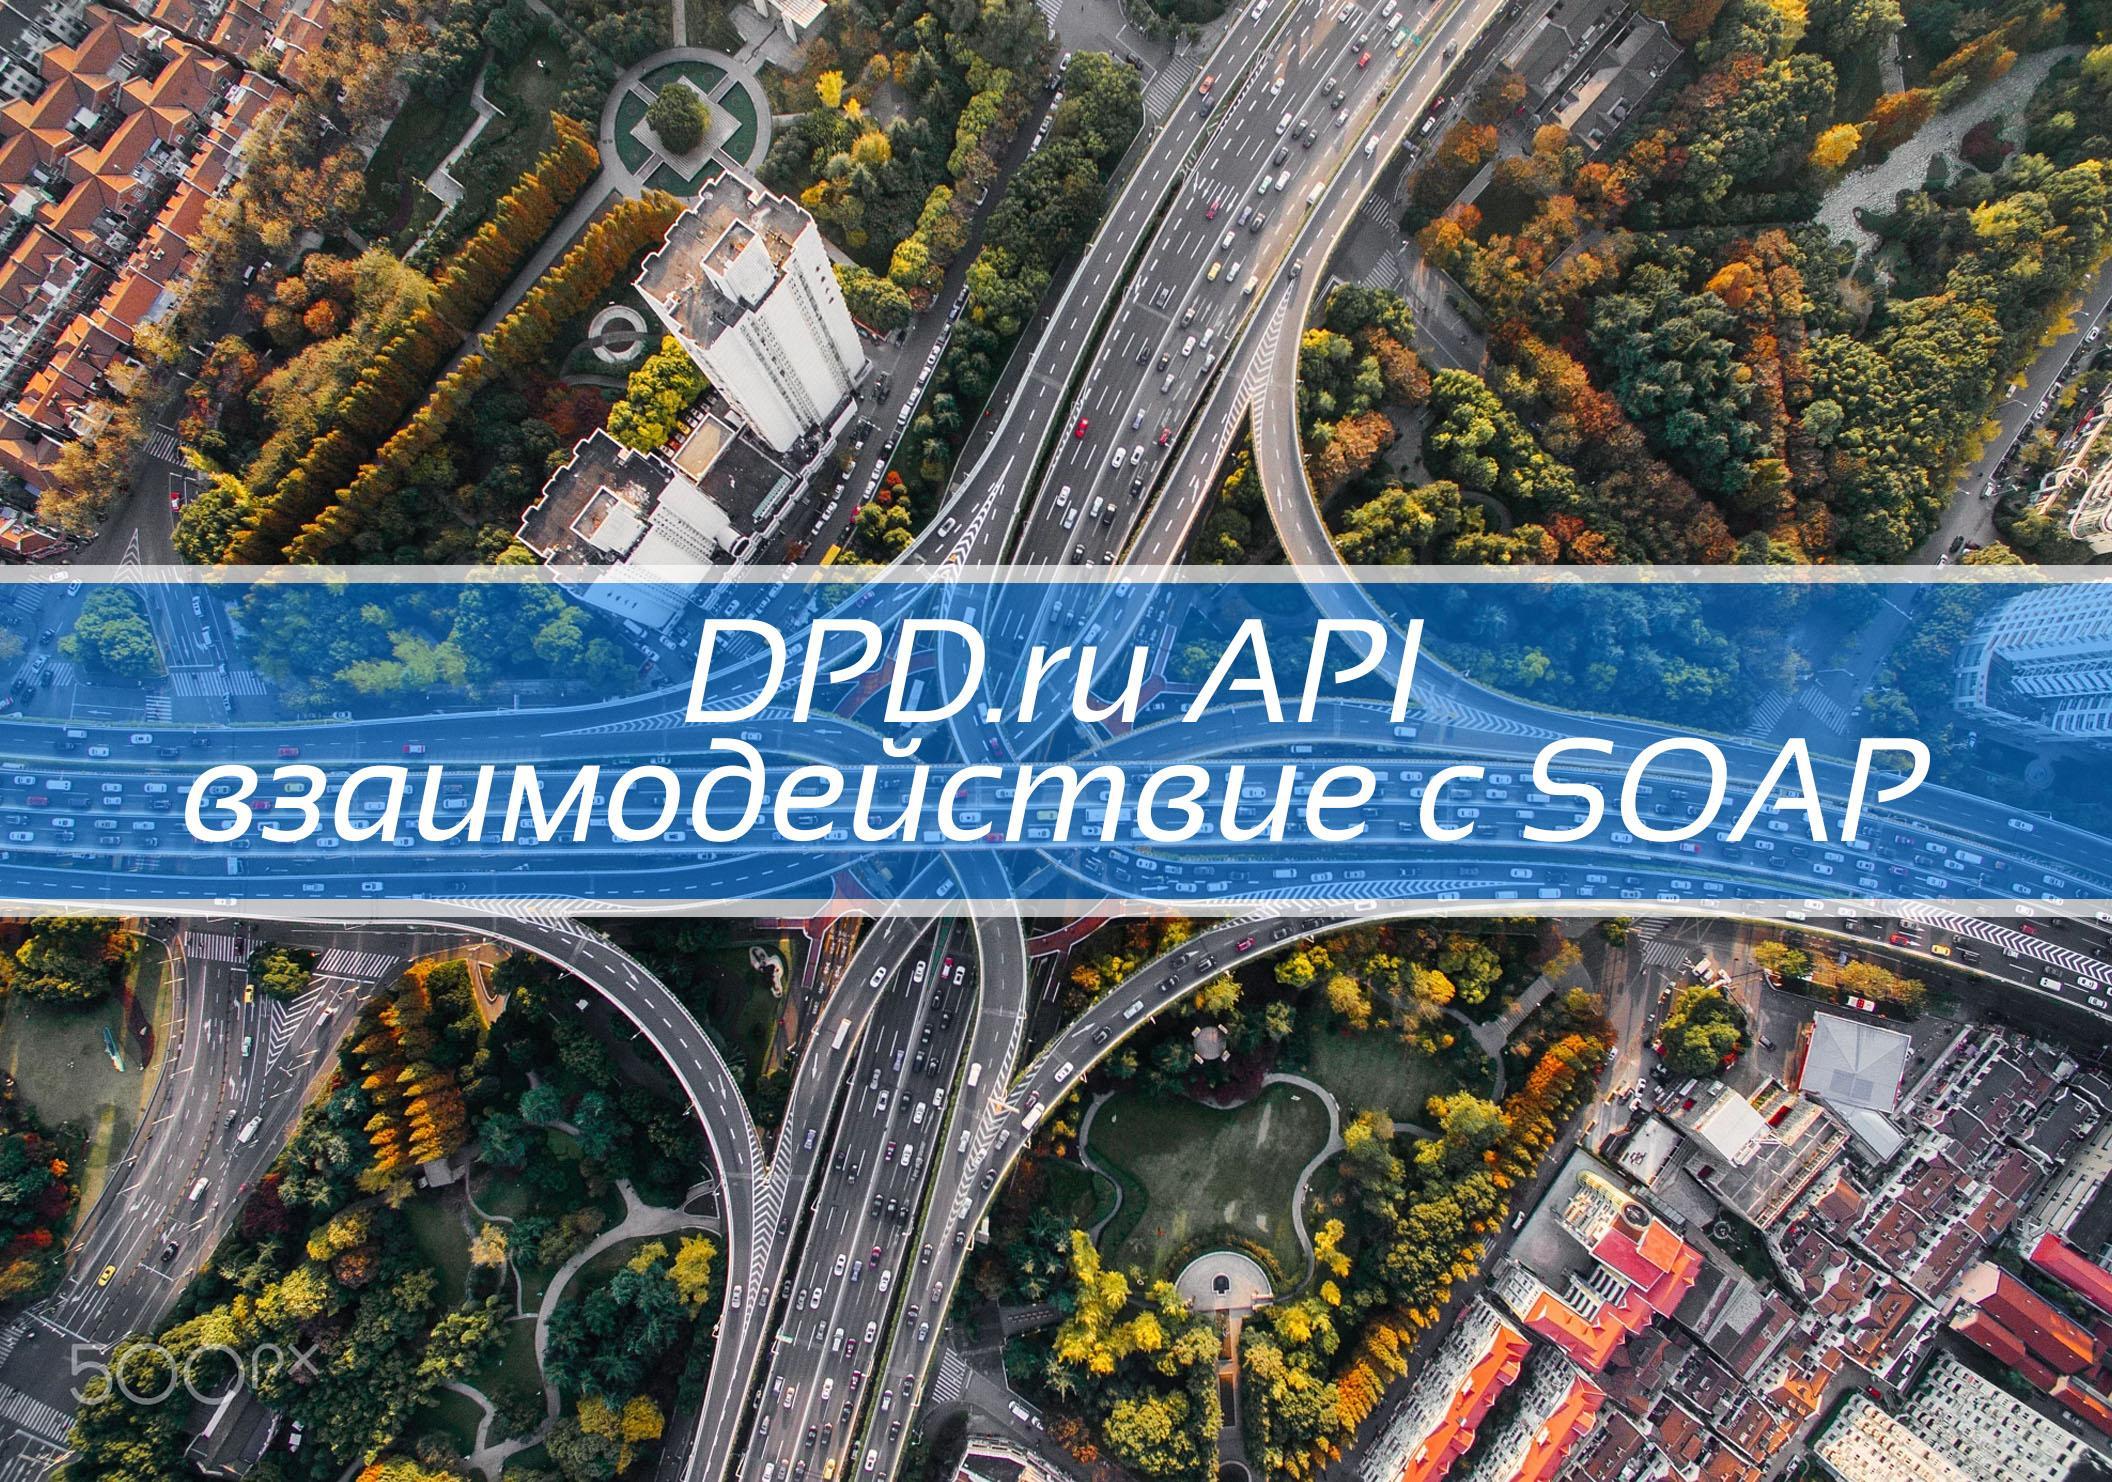 DPD.ru API взаимодействие с SOAP